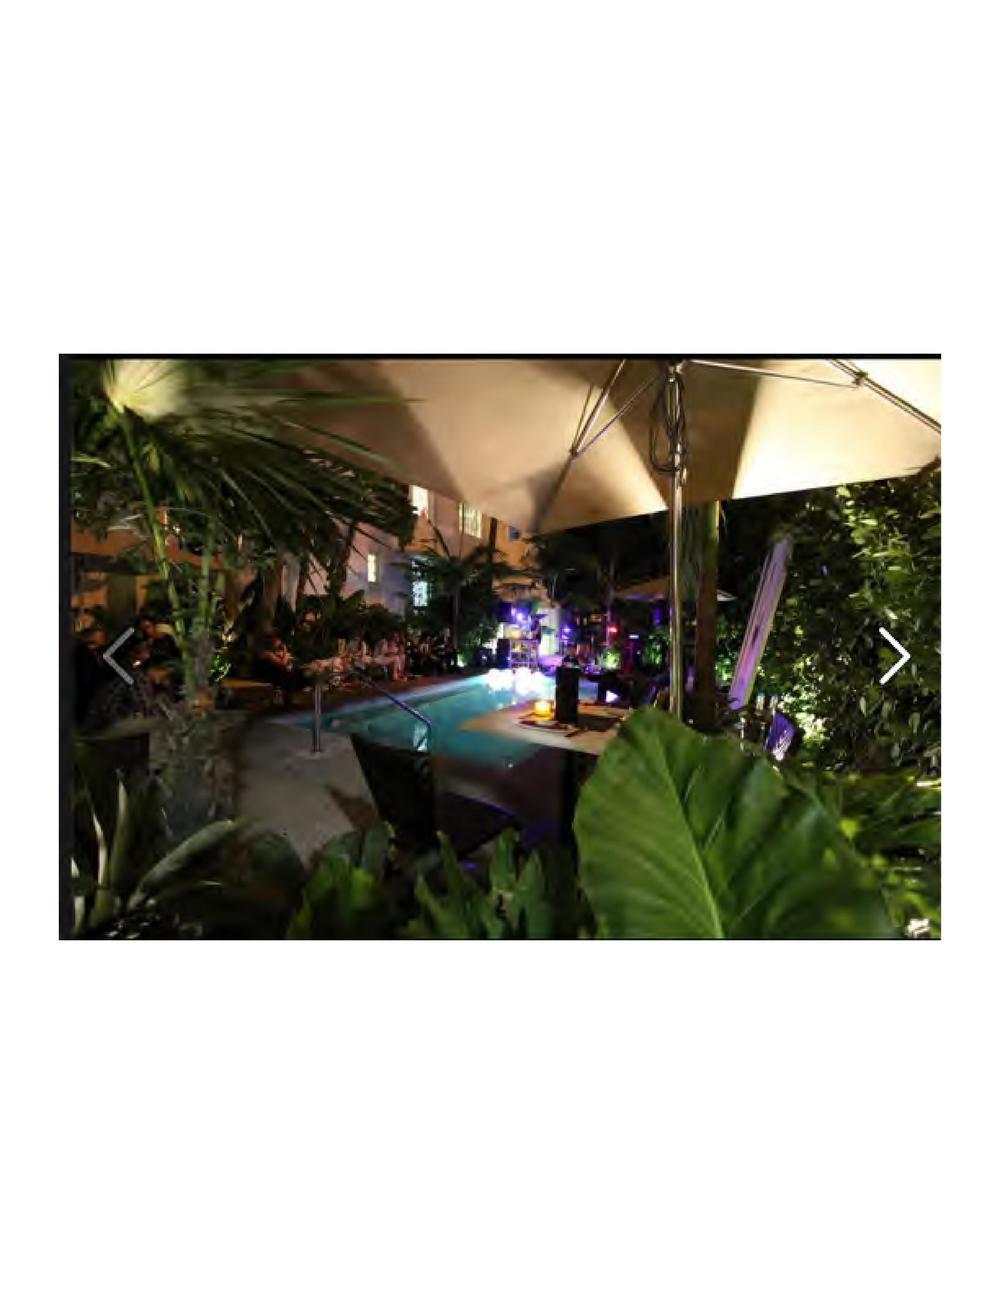 Miami_Art_Basel_Photographs-web-page-070.jpg